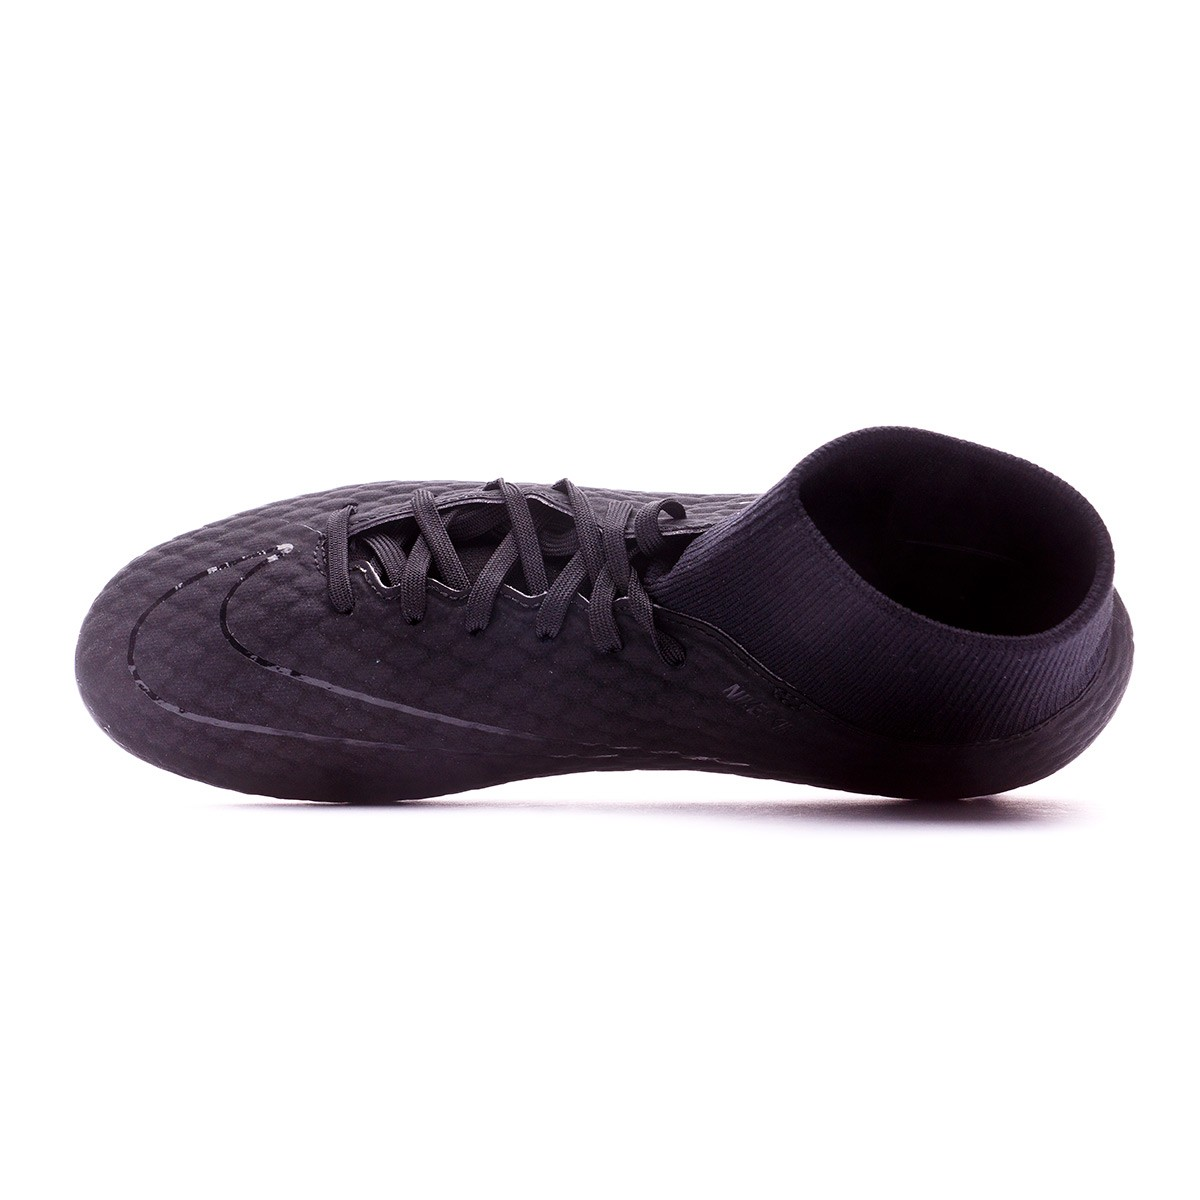 a6988fb74 Football Boots Nike Hypervenom Phelon III DF AG-Pro Black - Tienda de  fútbol Fútbol Emotion